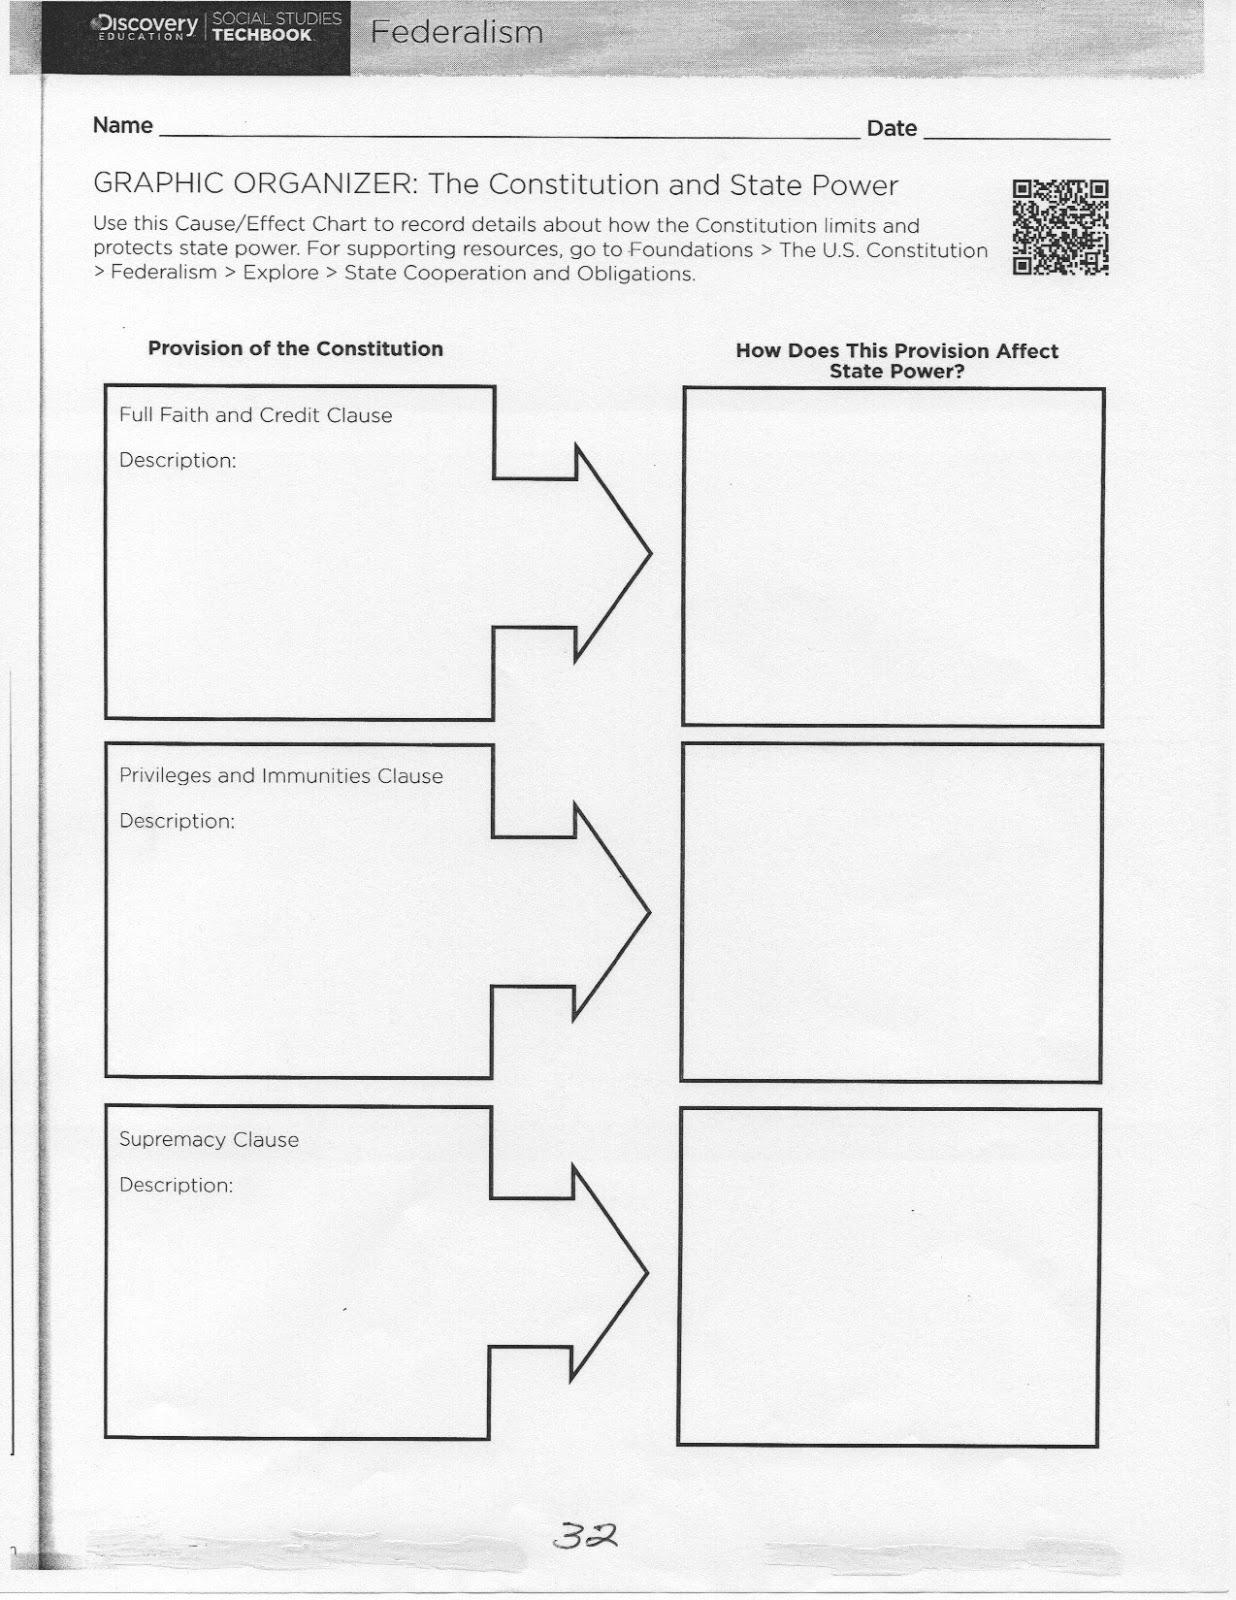 Coach Green S Class Unit 5 Worksheets Federalism